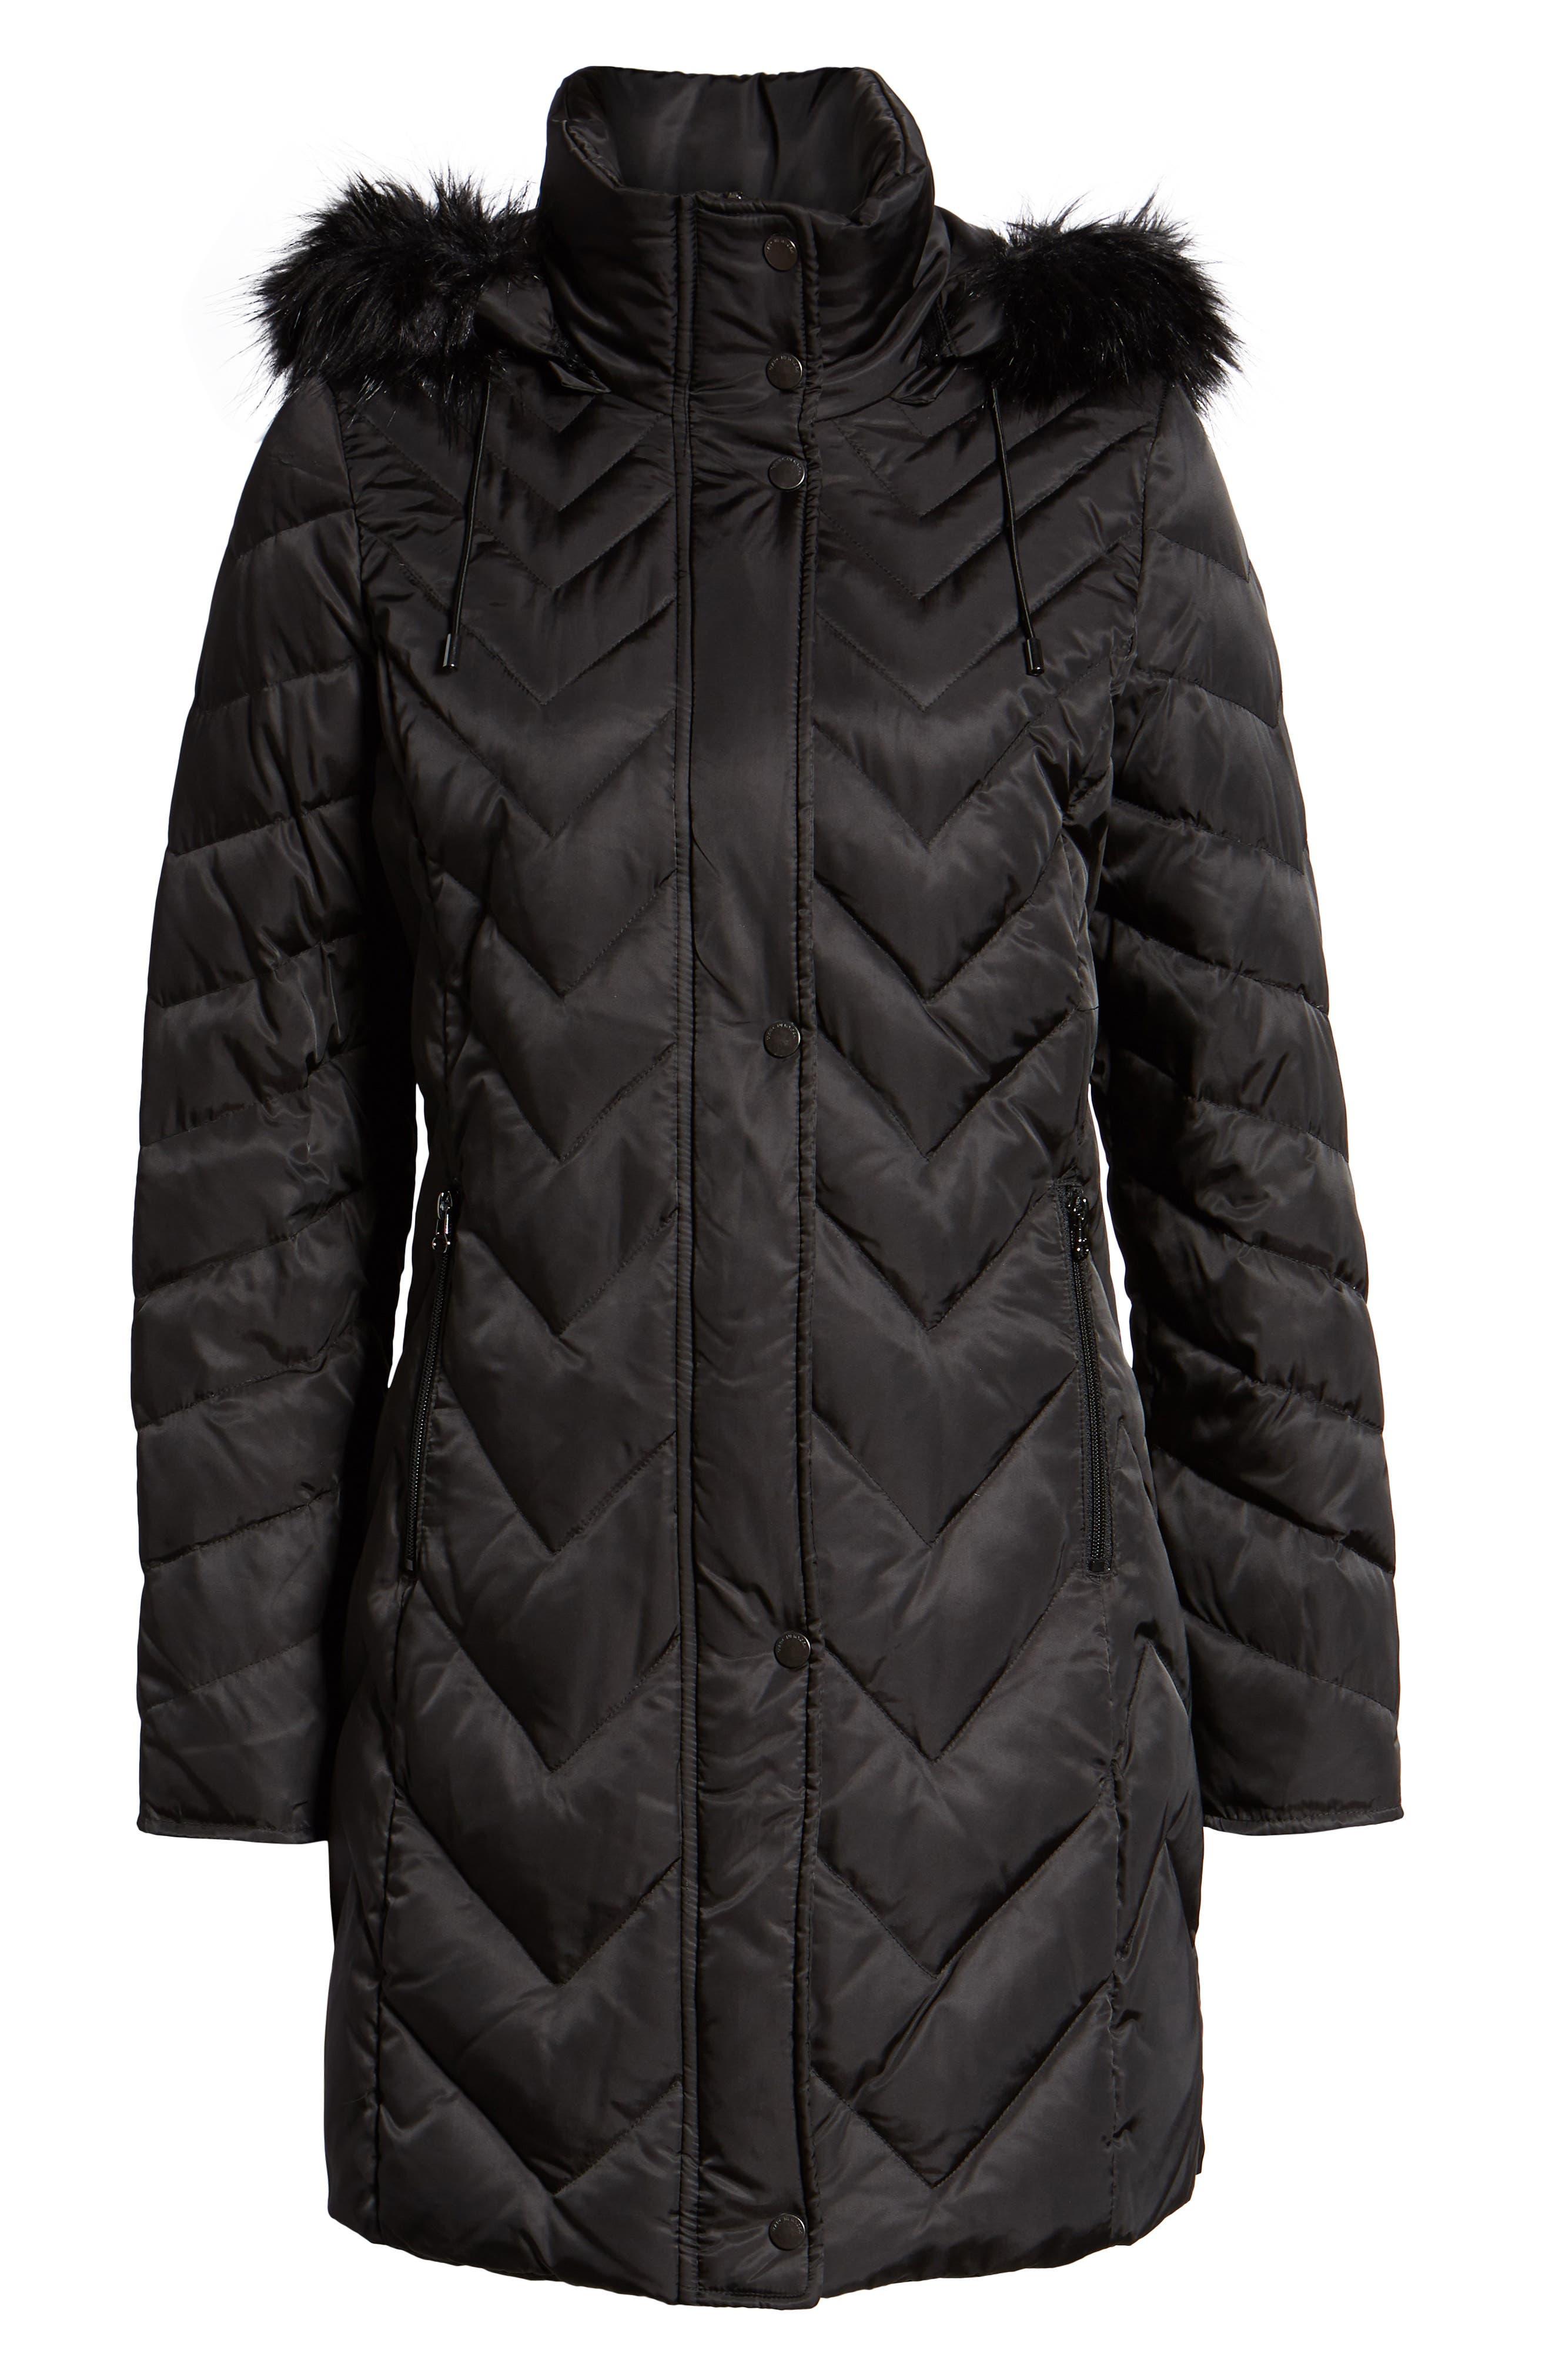 MARC NEW YORK, Matte Satin Chevron Faux Fur Trim Coat, Alternate thumbnail 6, color, BLACK